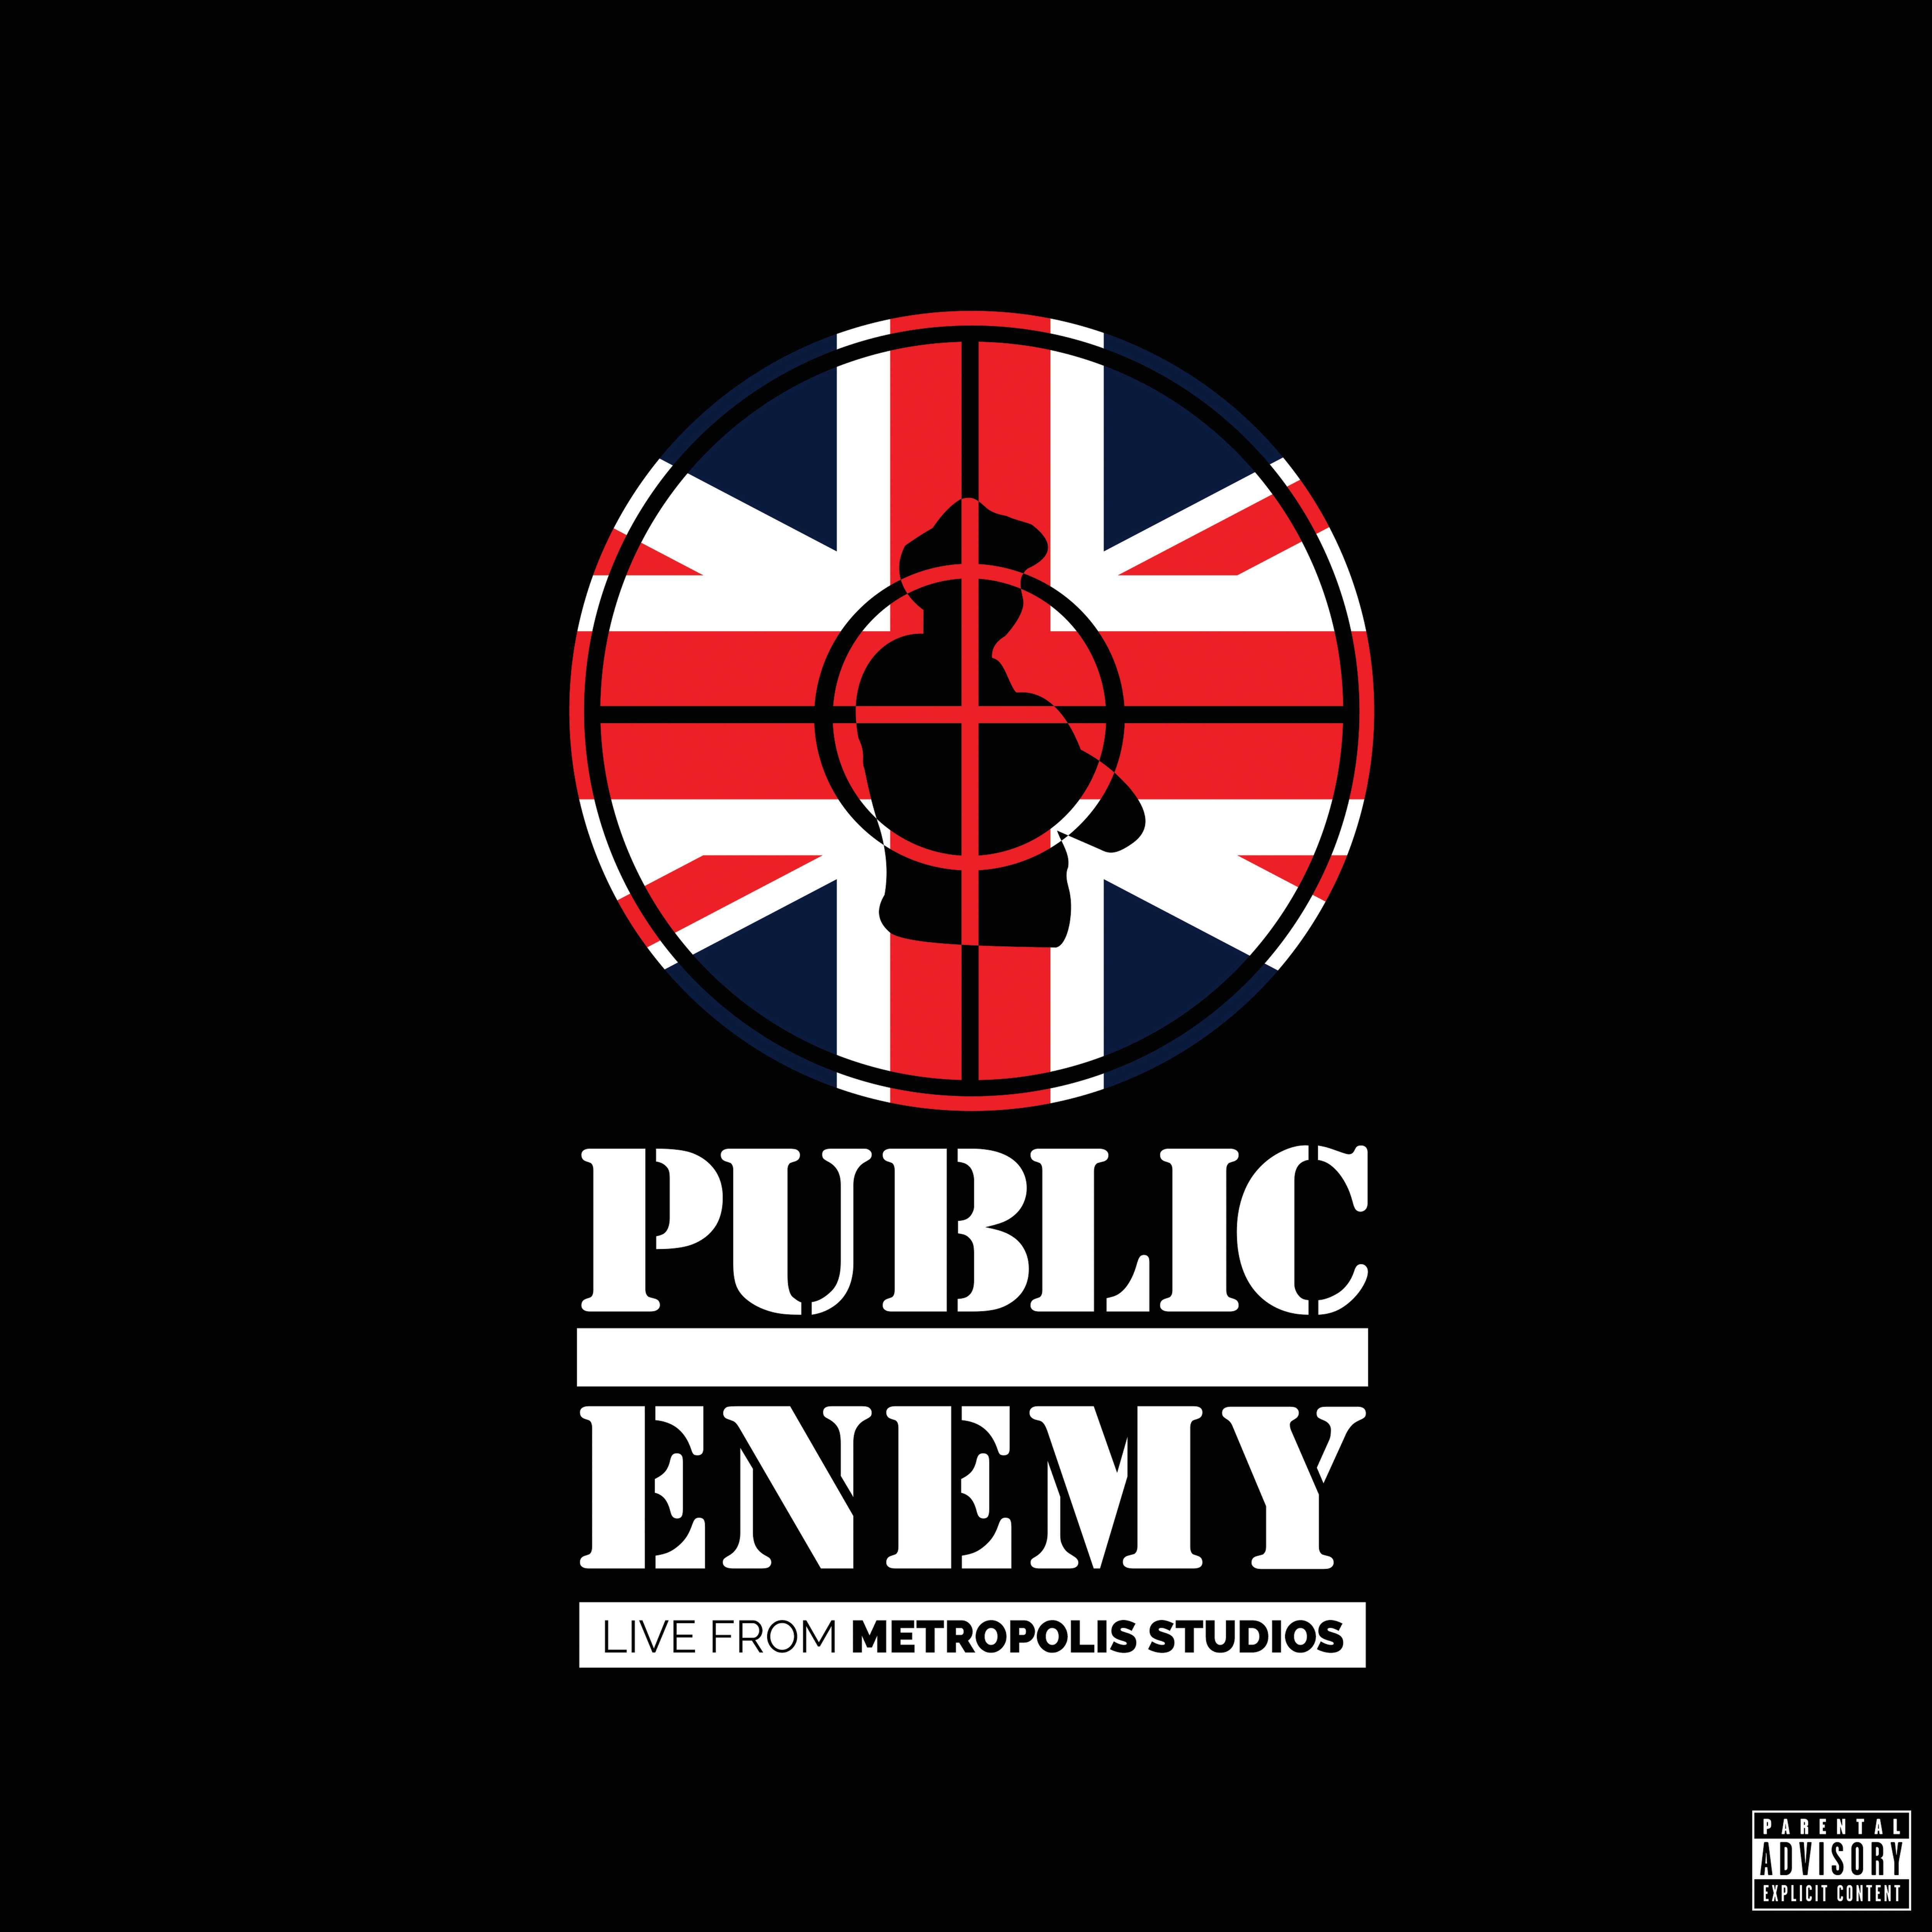 Public Enemy Live at Metropolis